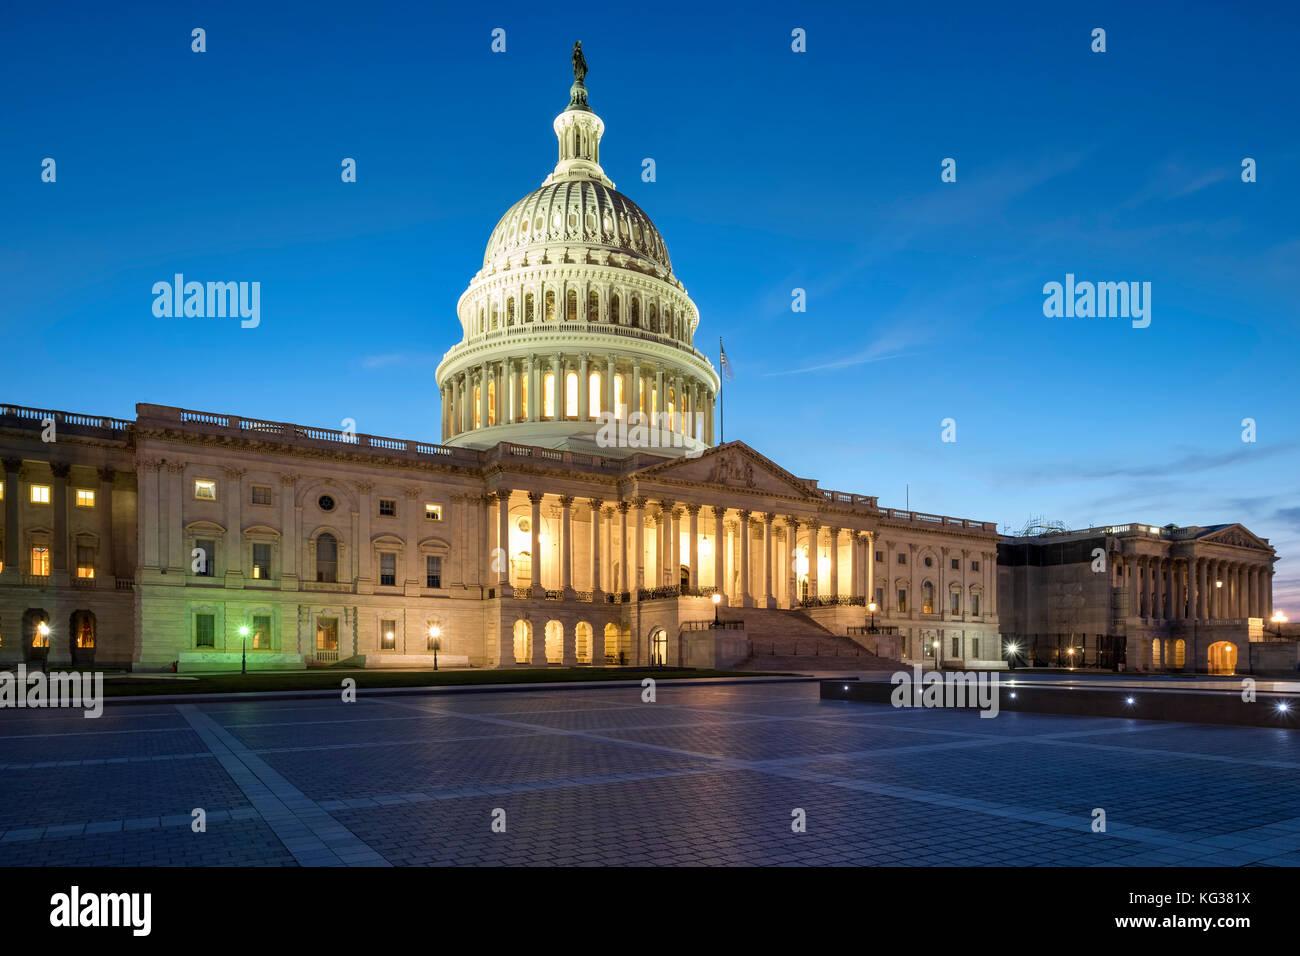 United States Capitol Building bei Nacht, Capitol Hill, Washington DC, USA Stockbild